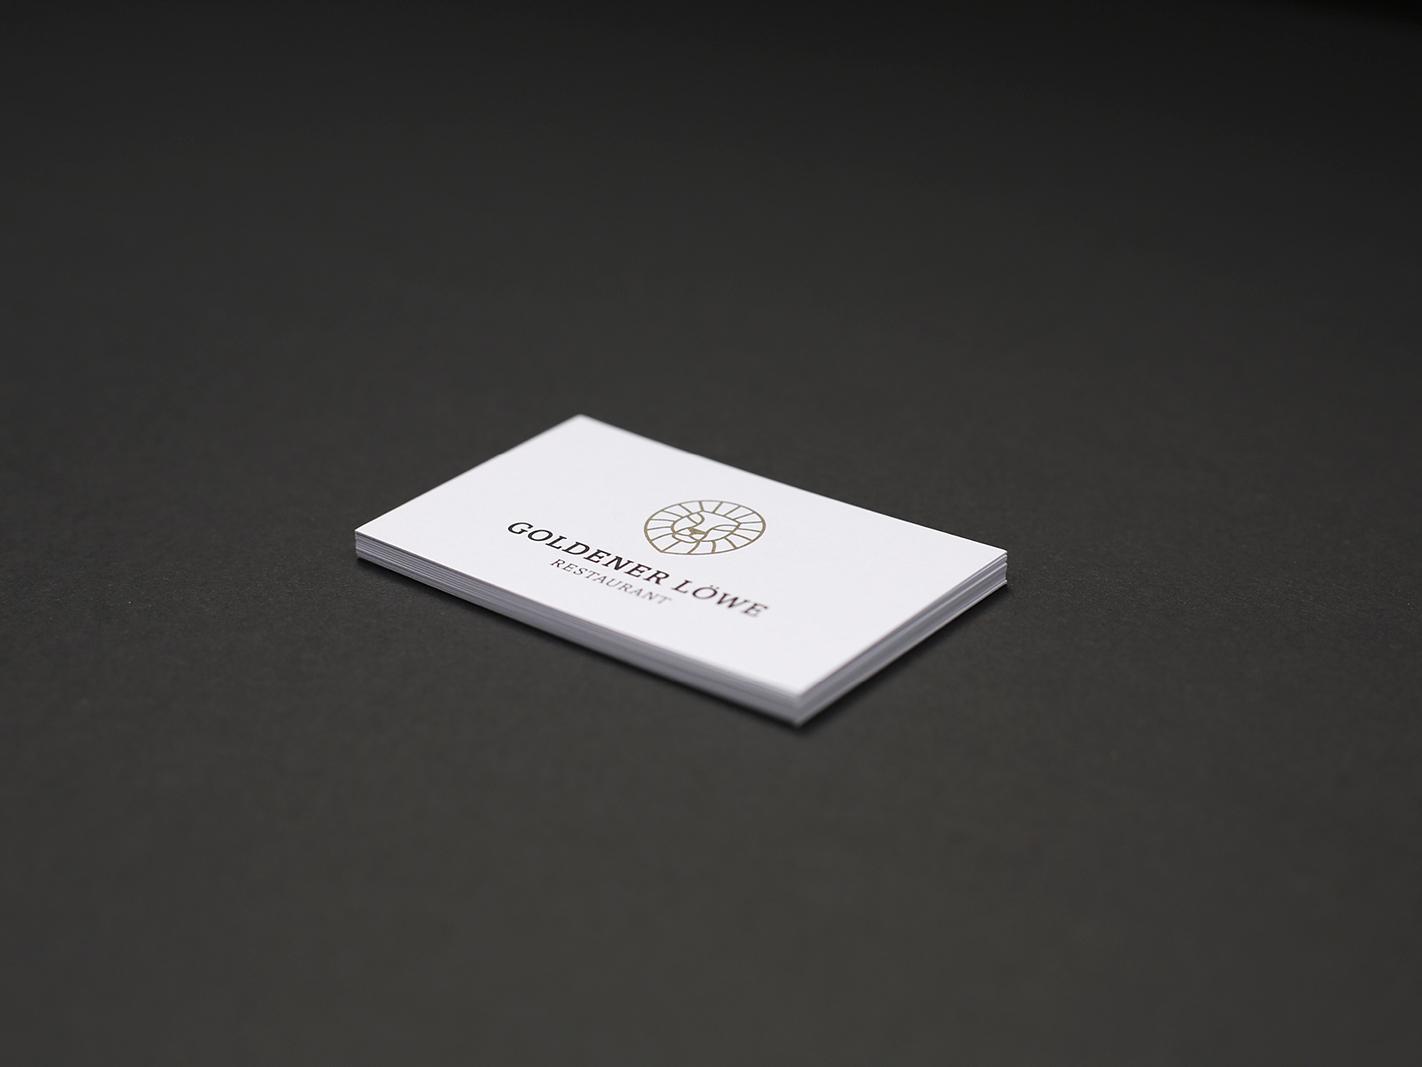 ATK-GOLDENER-LOEWE-RESTAURANT-Corporate-Design-4.jpg